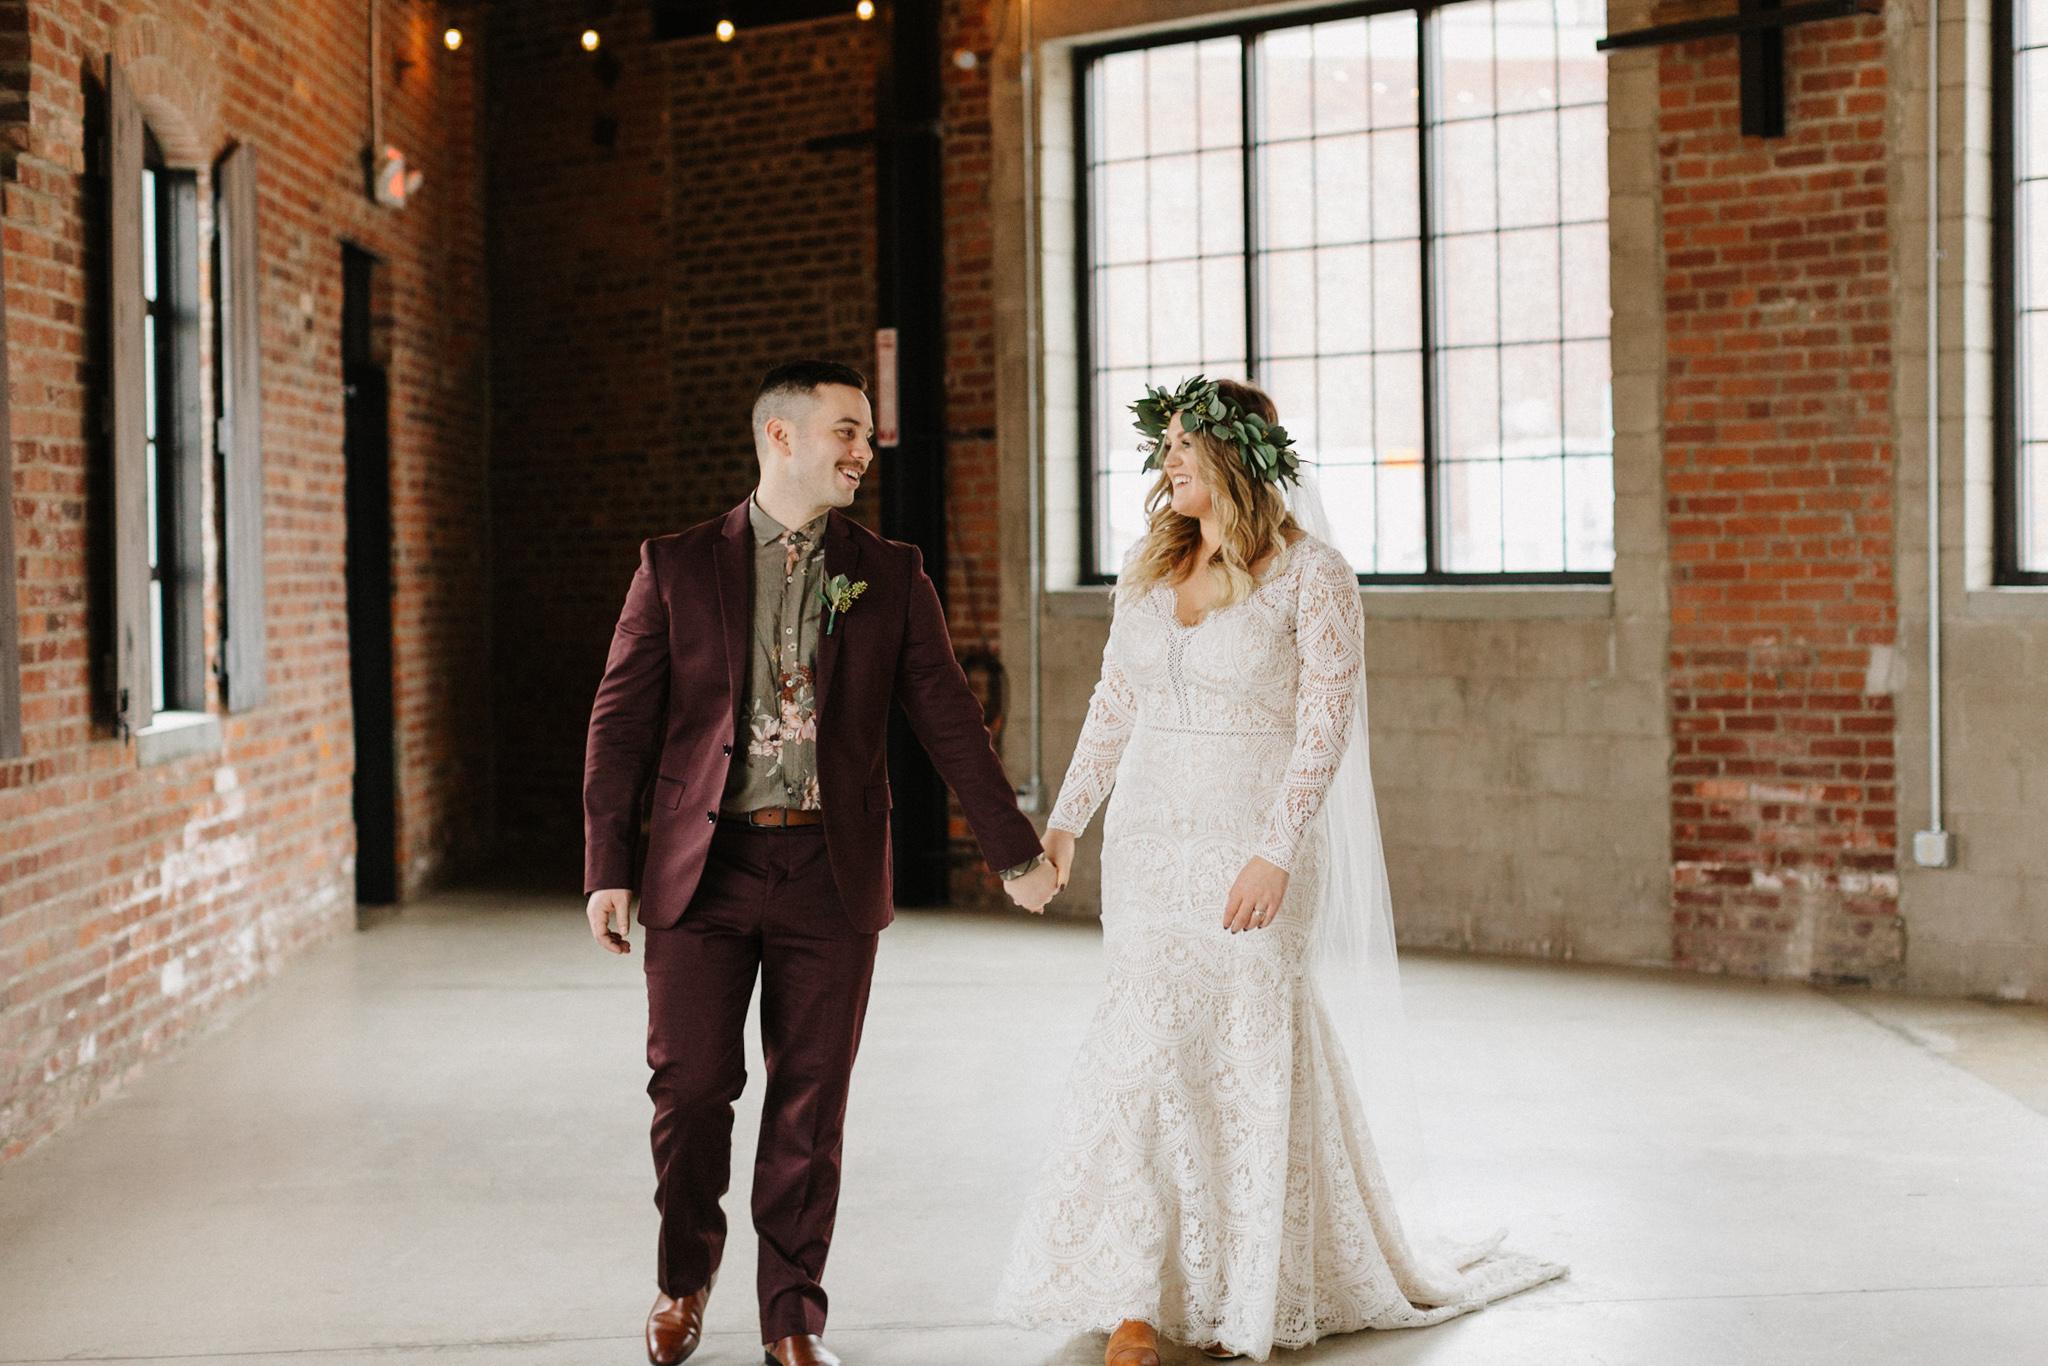 25_19-03-30 Caylen and Max Wedding Previews-49.jpg